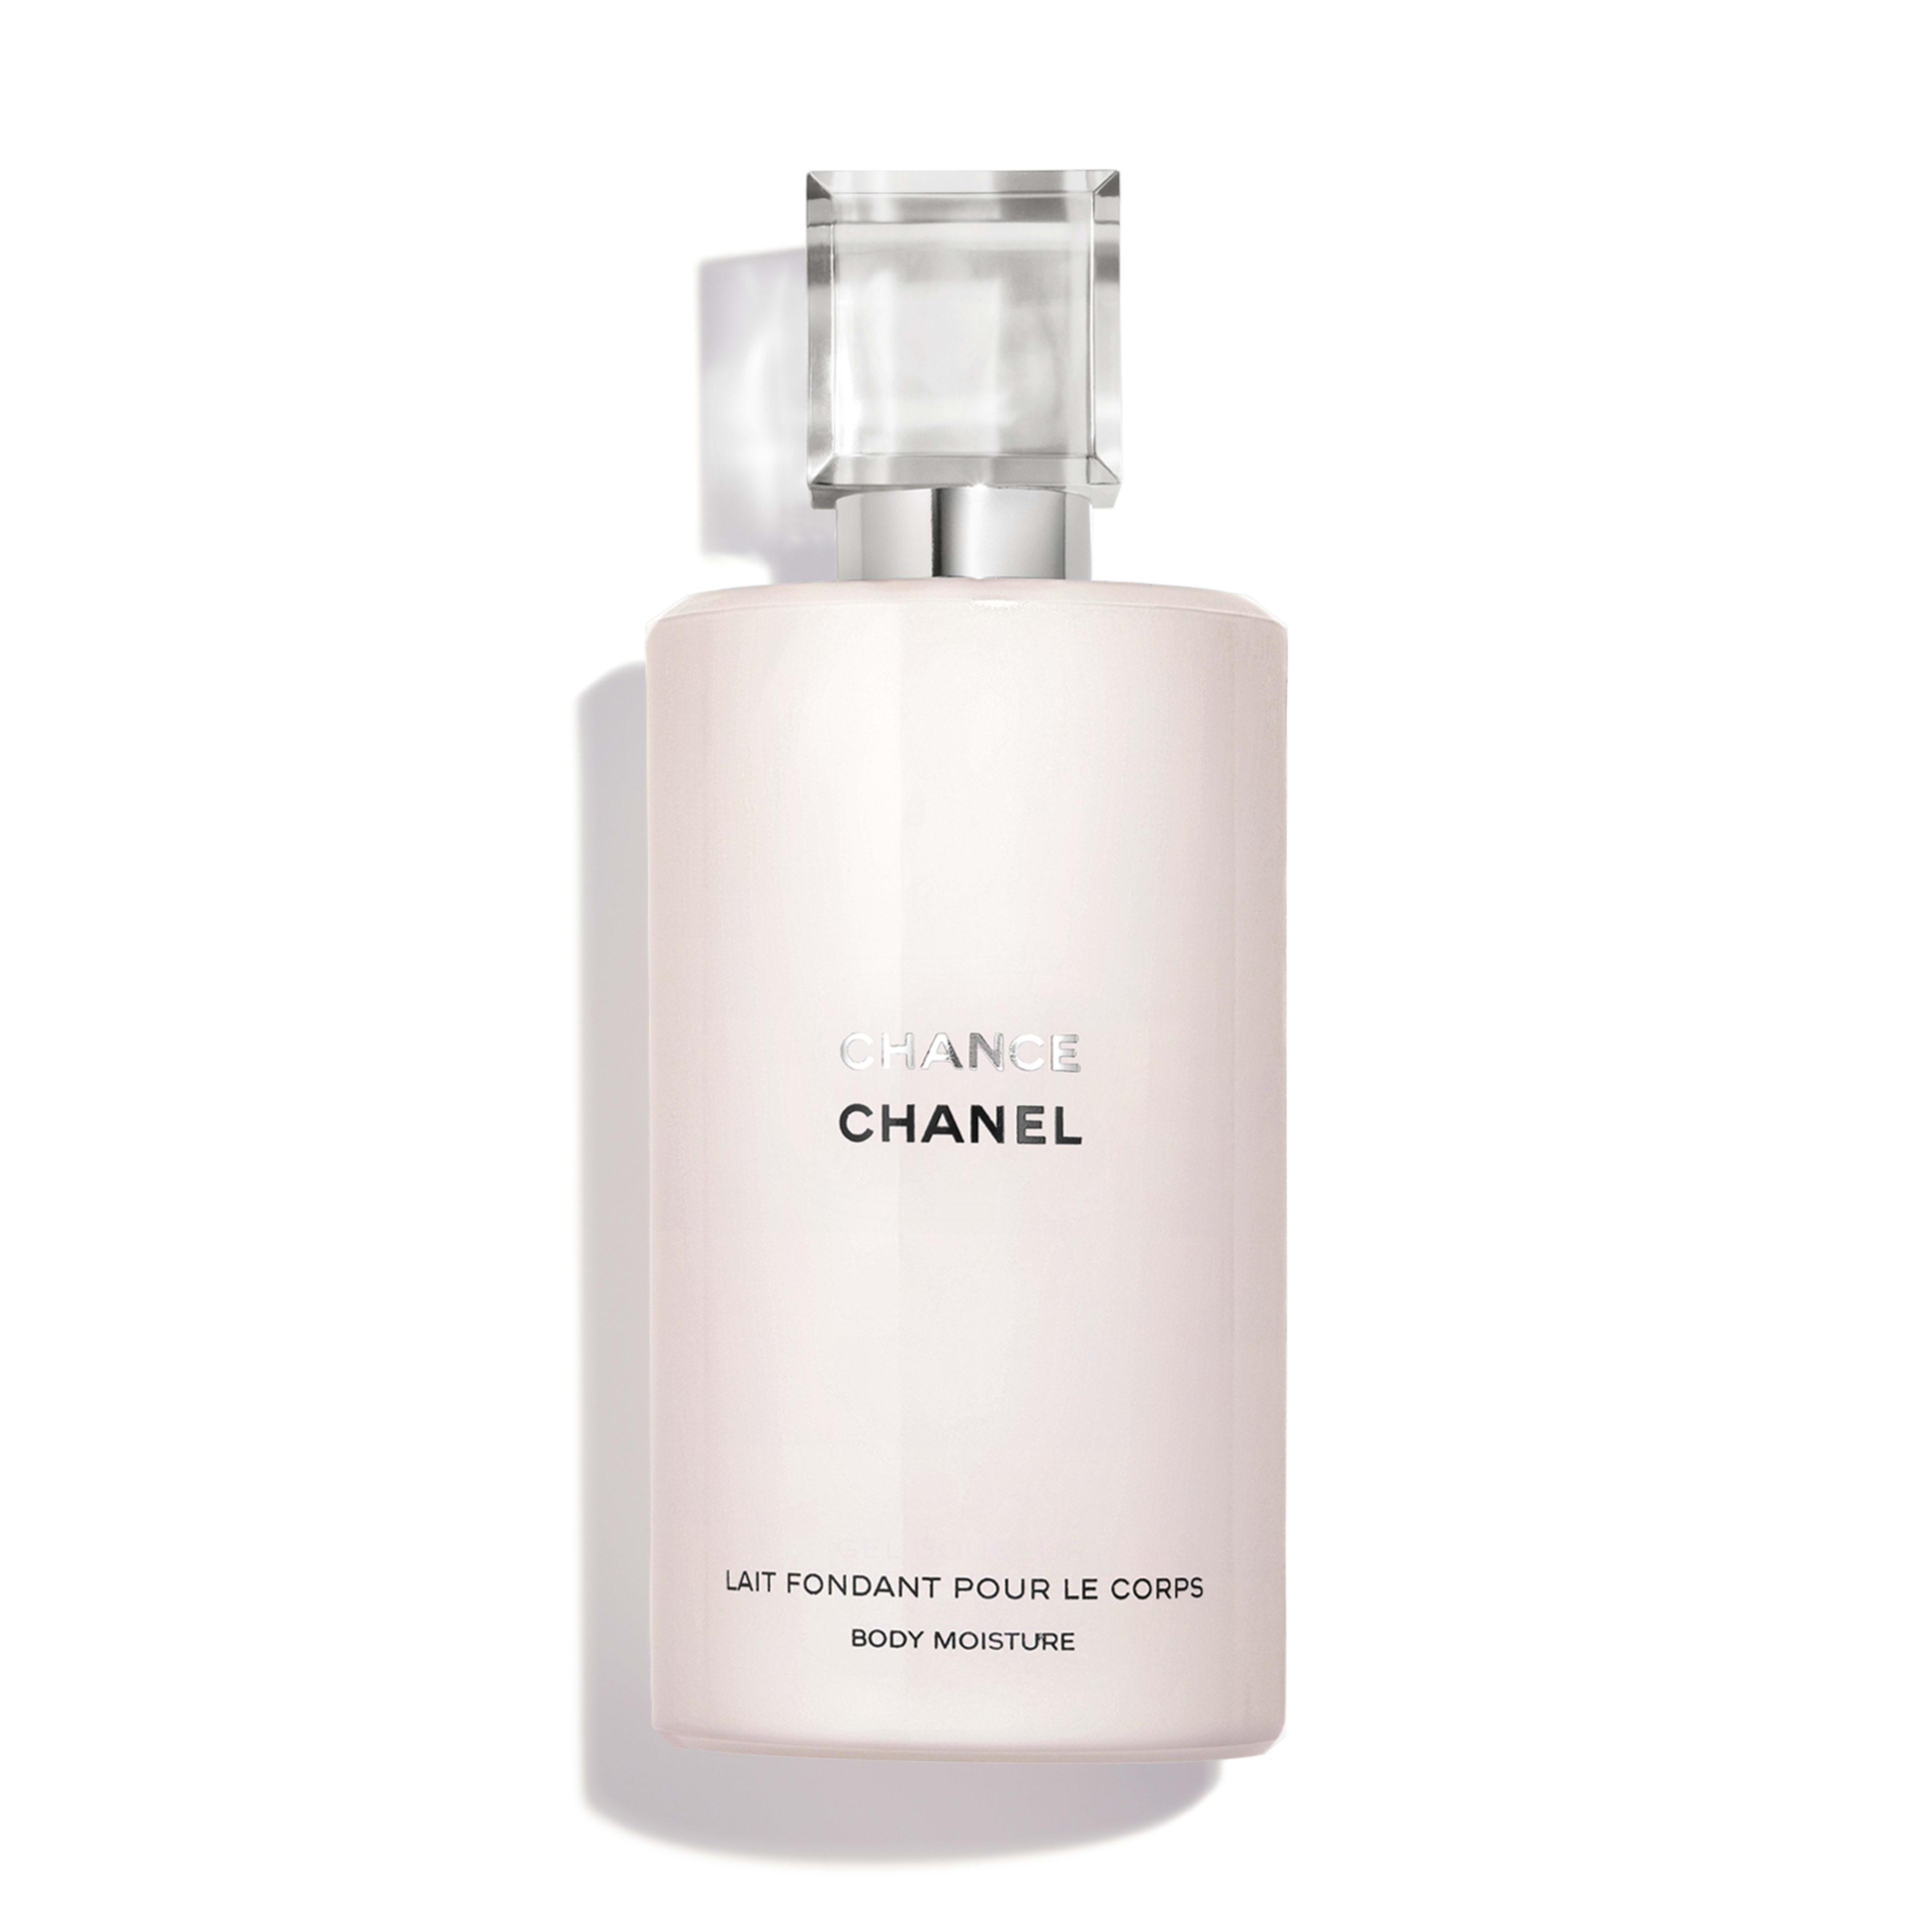 CHANCE - fragrance - 200ml - มุมมองปัจจุบัน